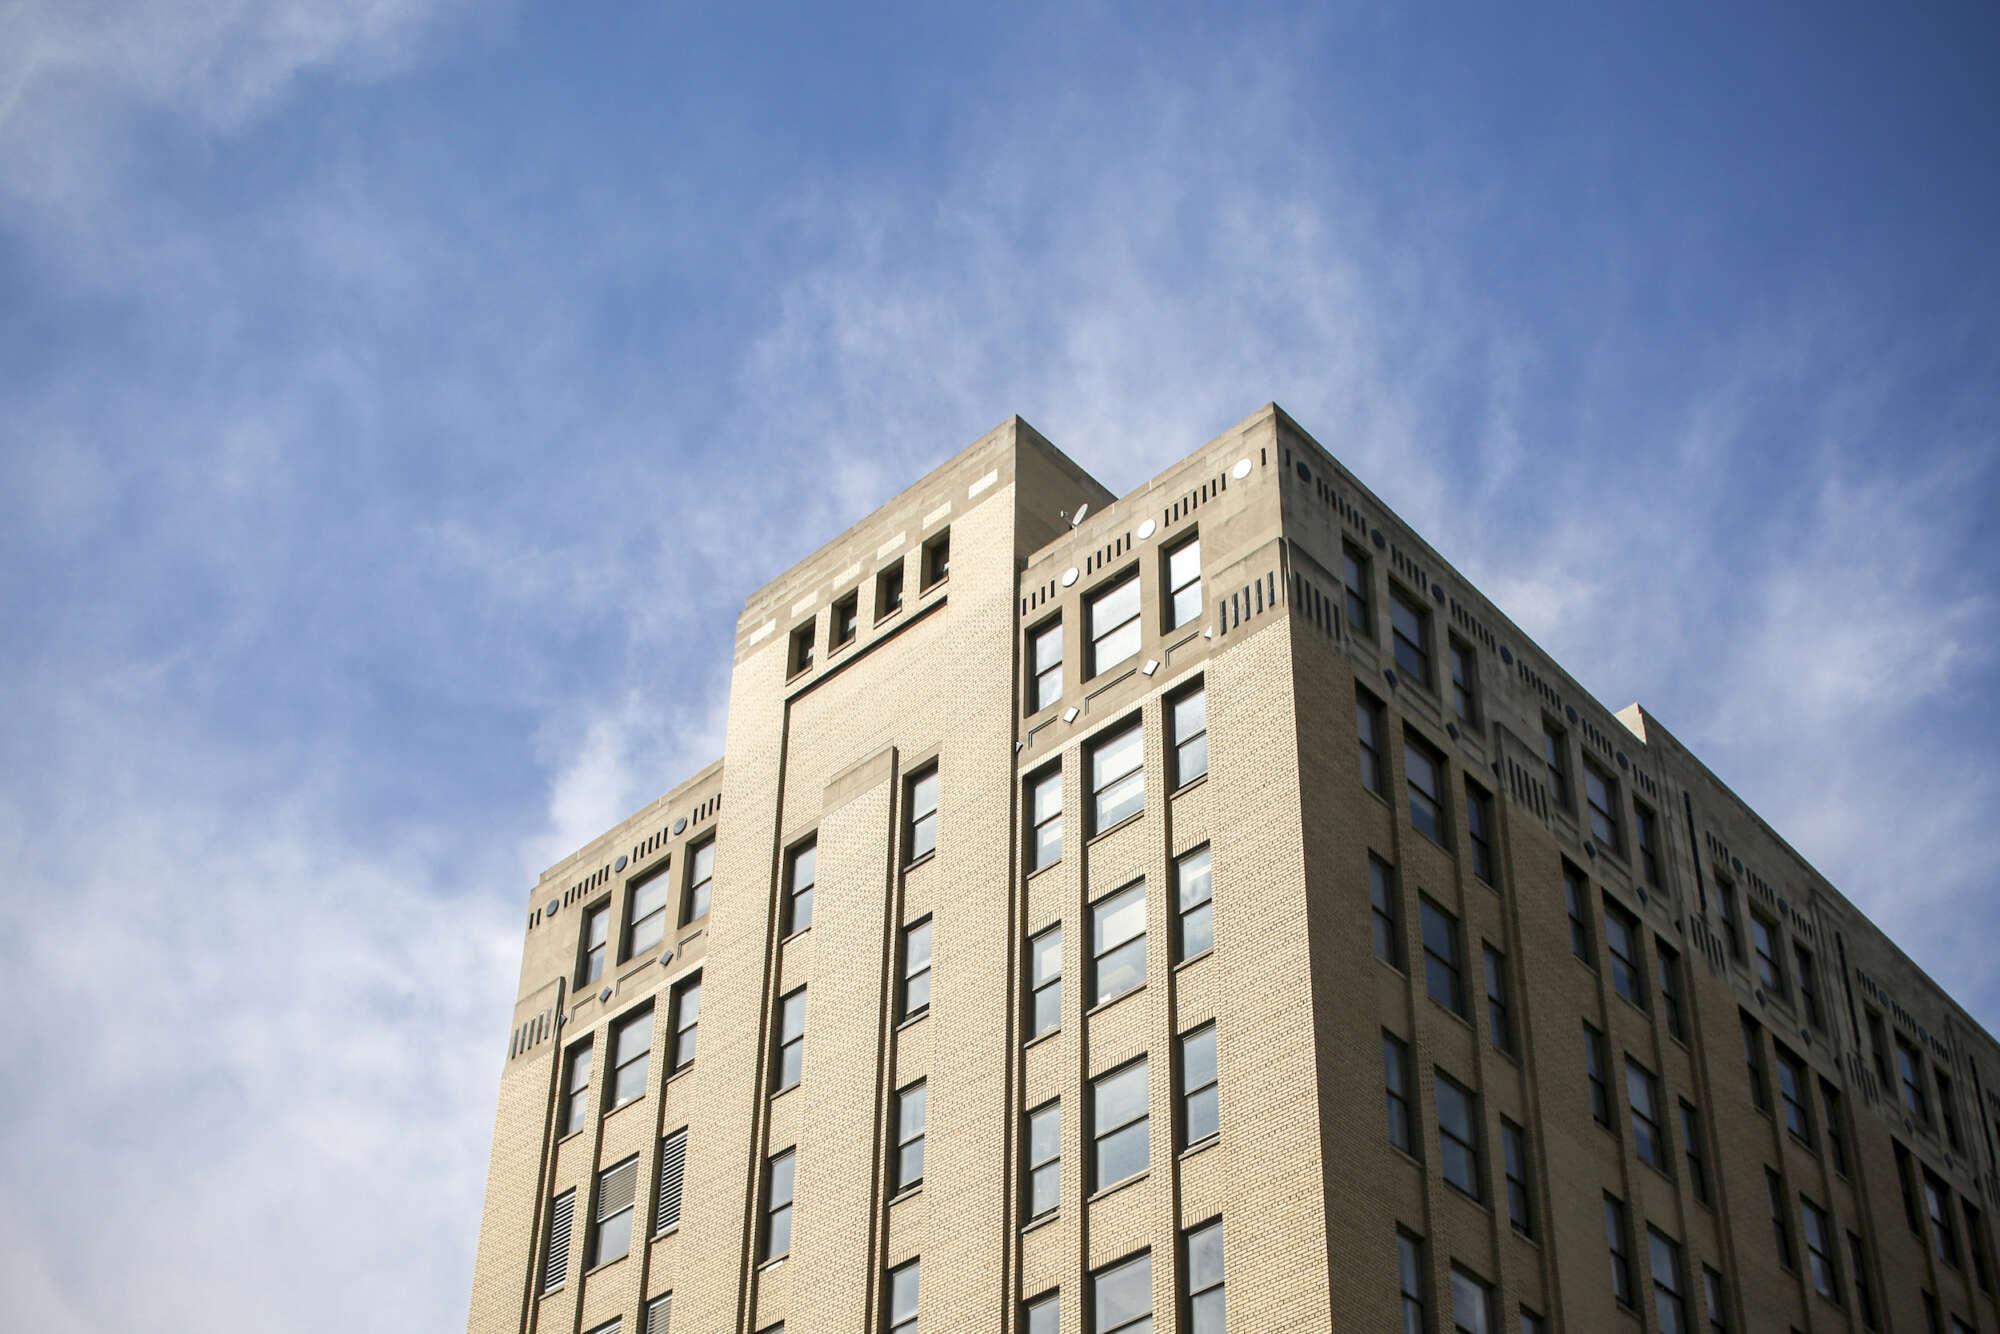 260 East 161st Street building upper floors framed against cloudy blue sky